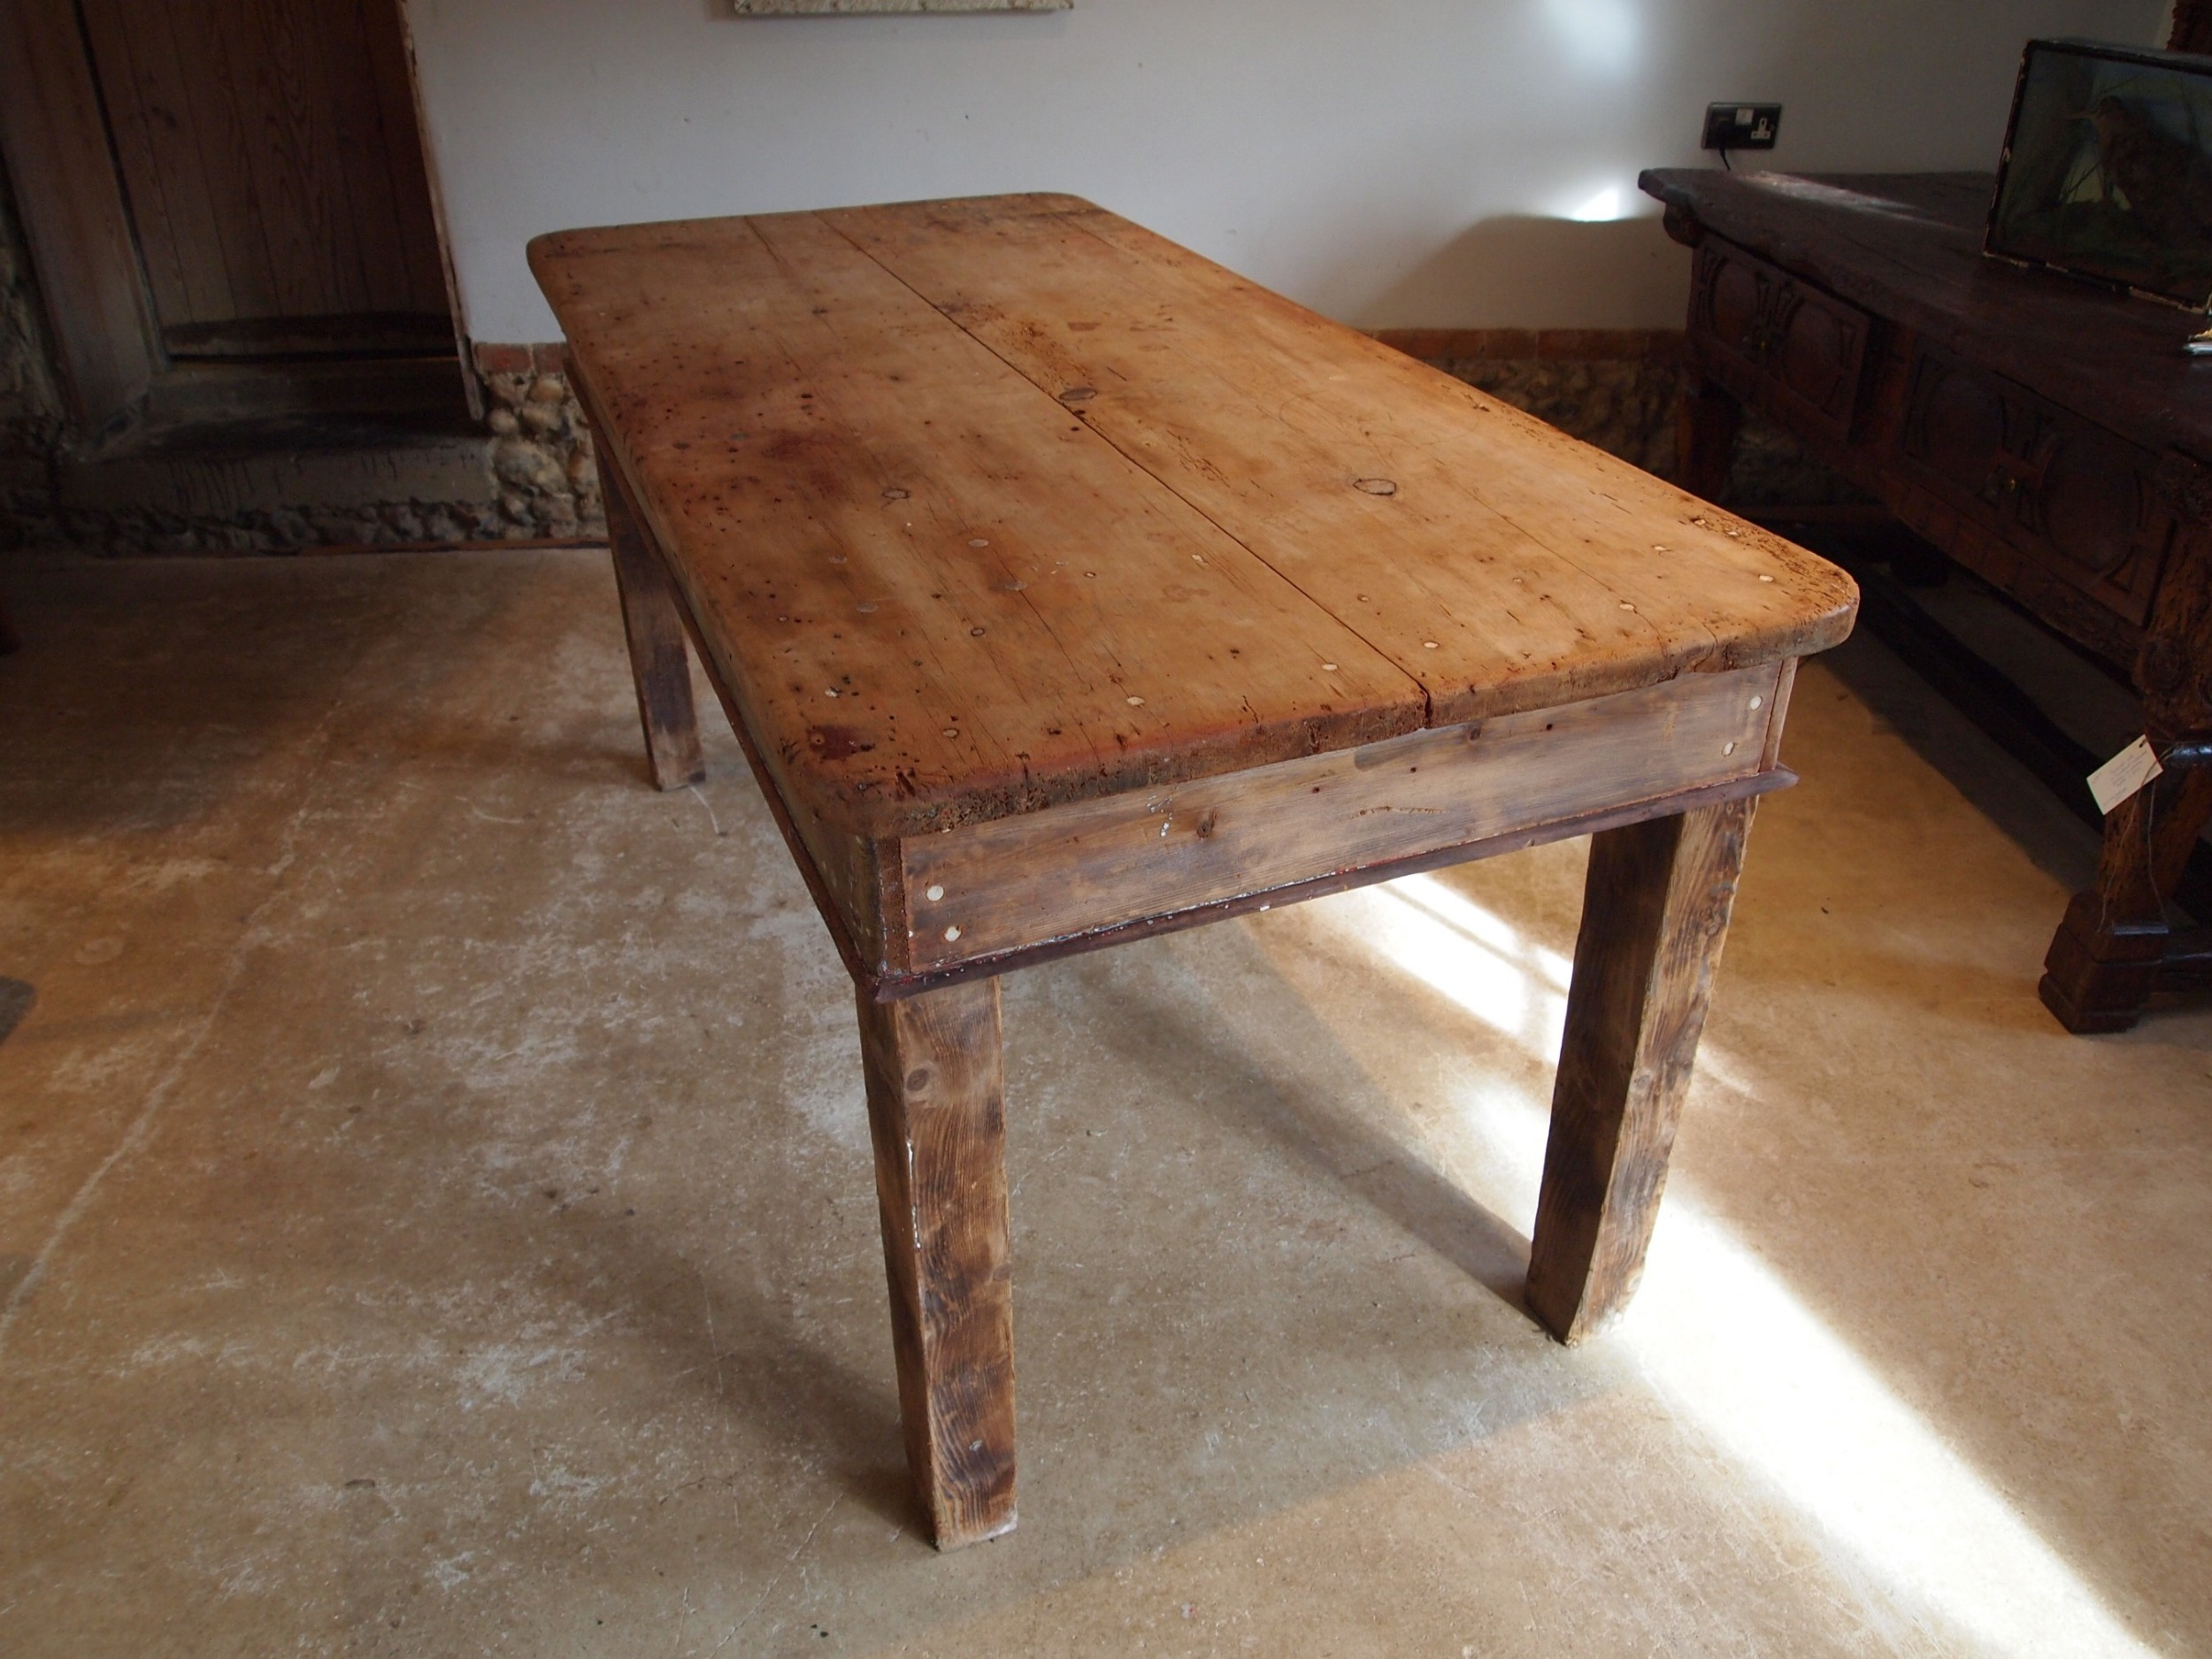 table edwardian refectory farmhouse deal rustic seats 68 c1900